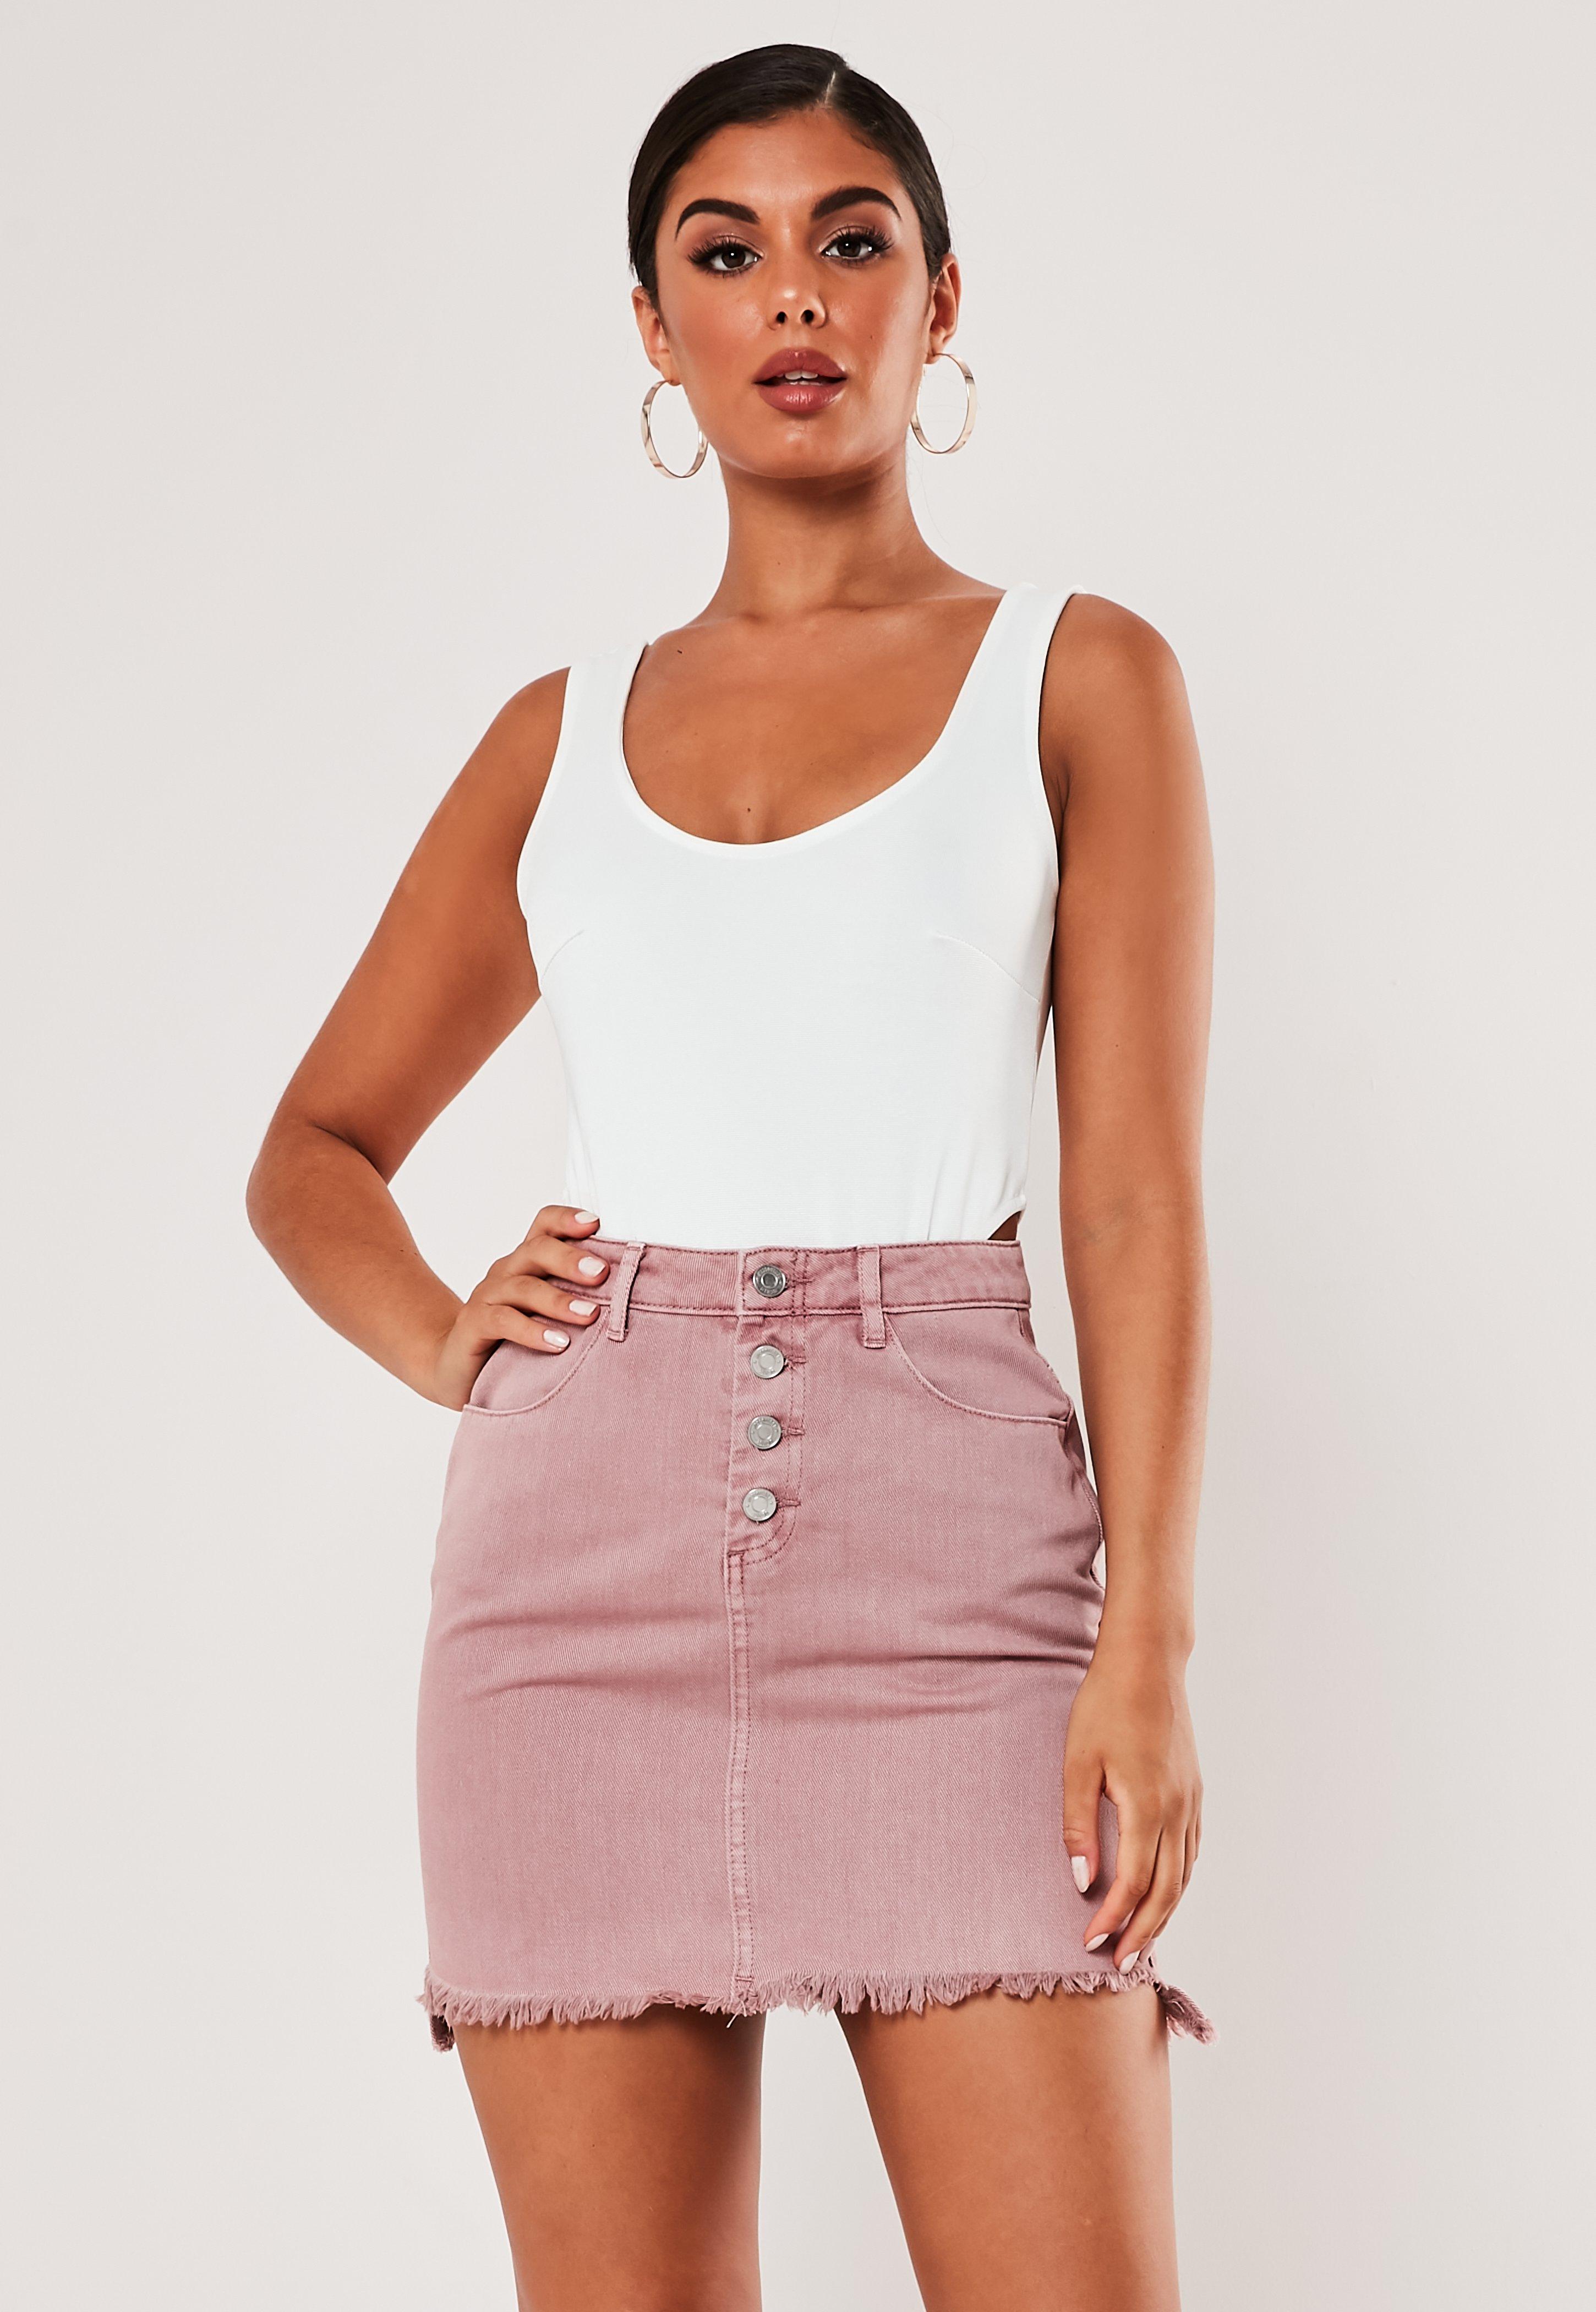 49547377dc56 Denim Skirts | Jean Skirts for Women - Missguided Ireland